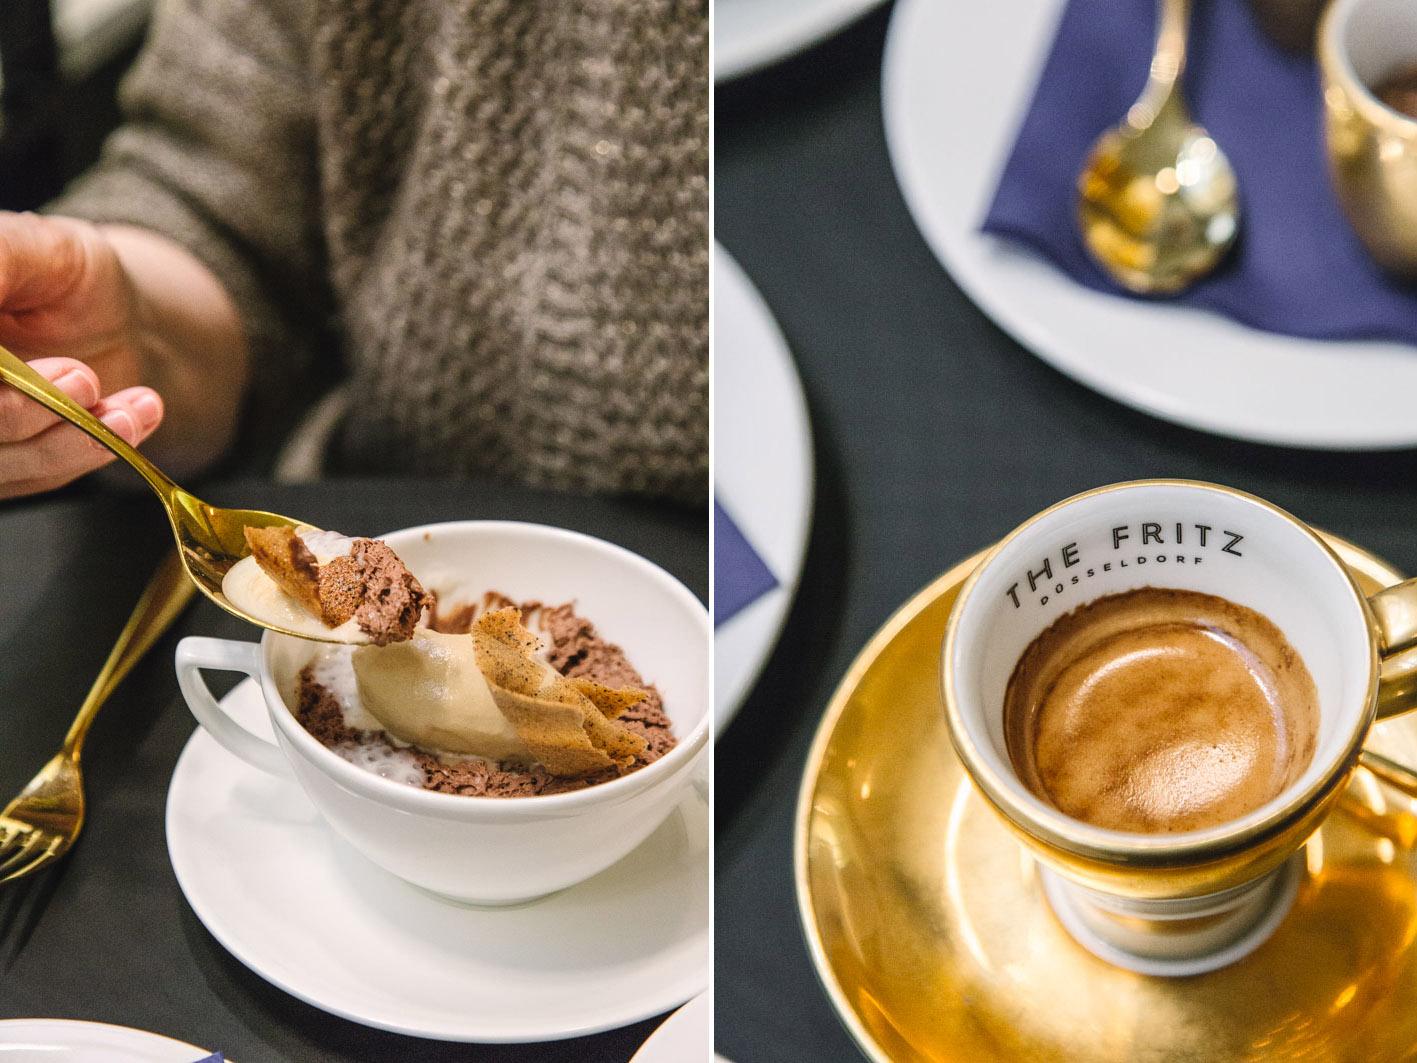 Espresso im Fritz's Frau Franzi